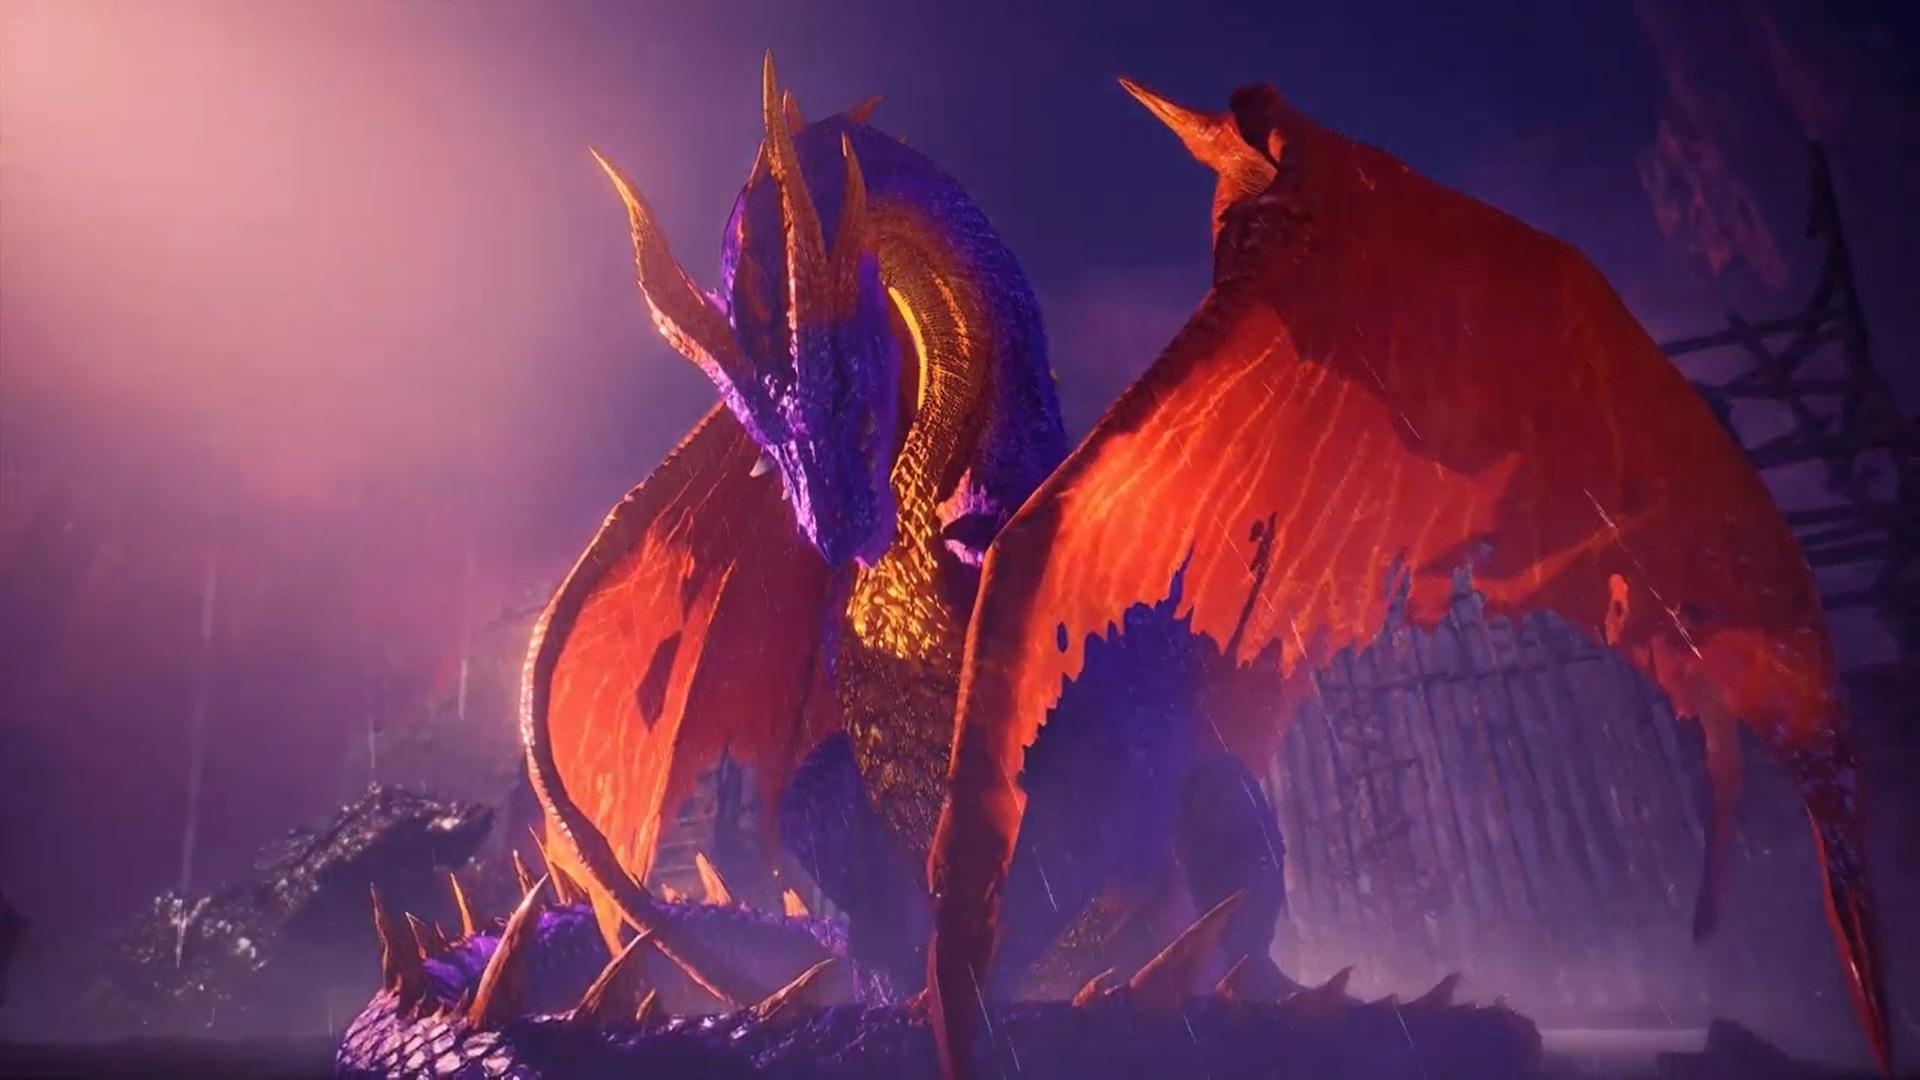 Monster Hunter World Mod Makes Fatalis Into Spyro the Dragon